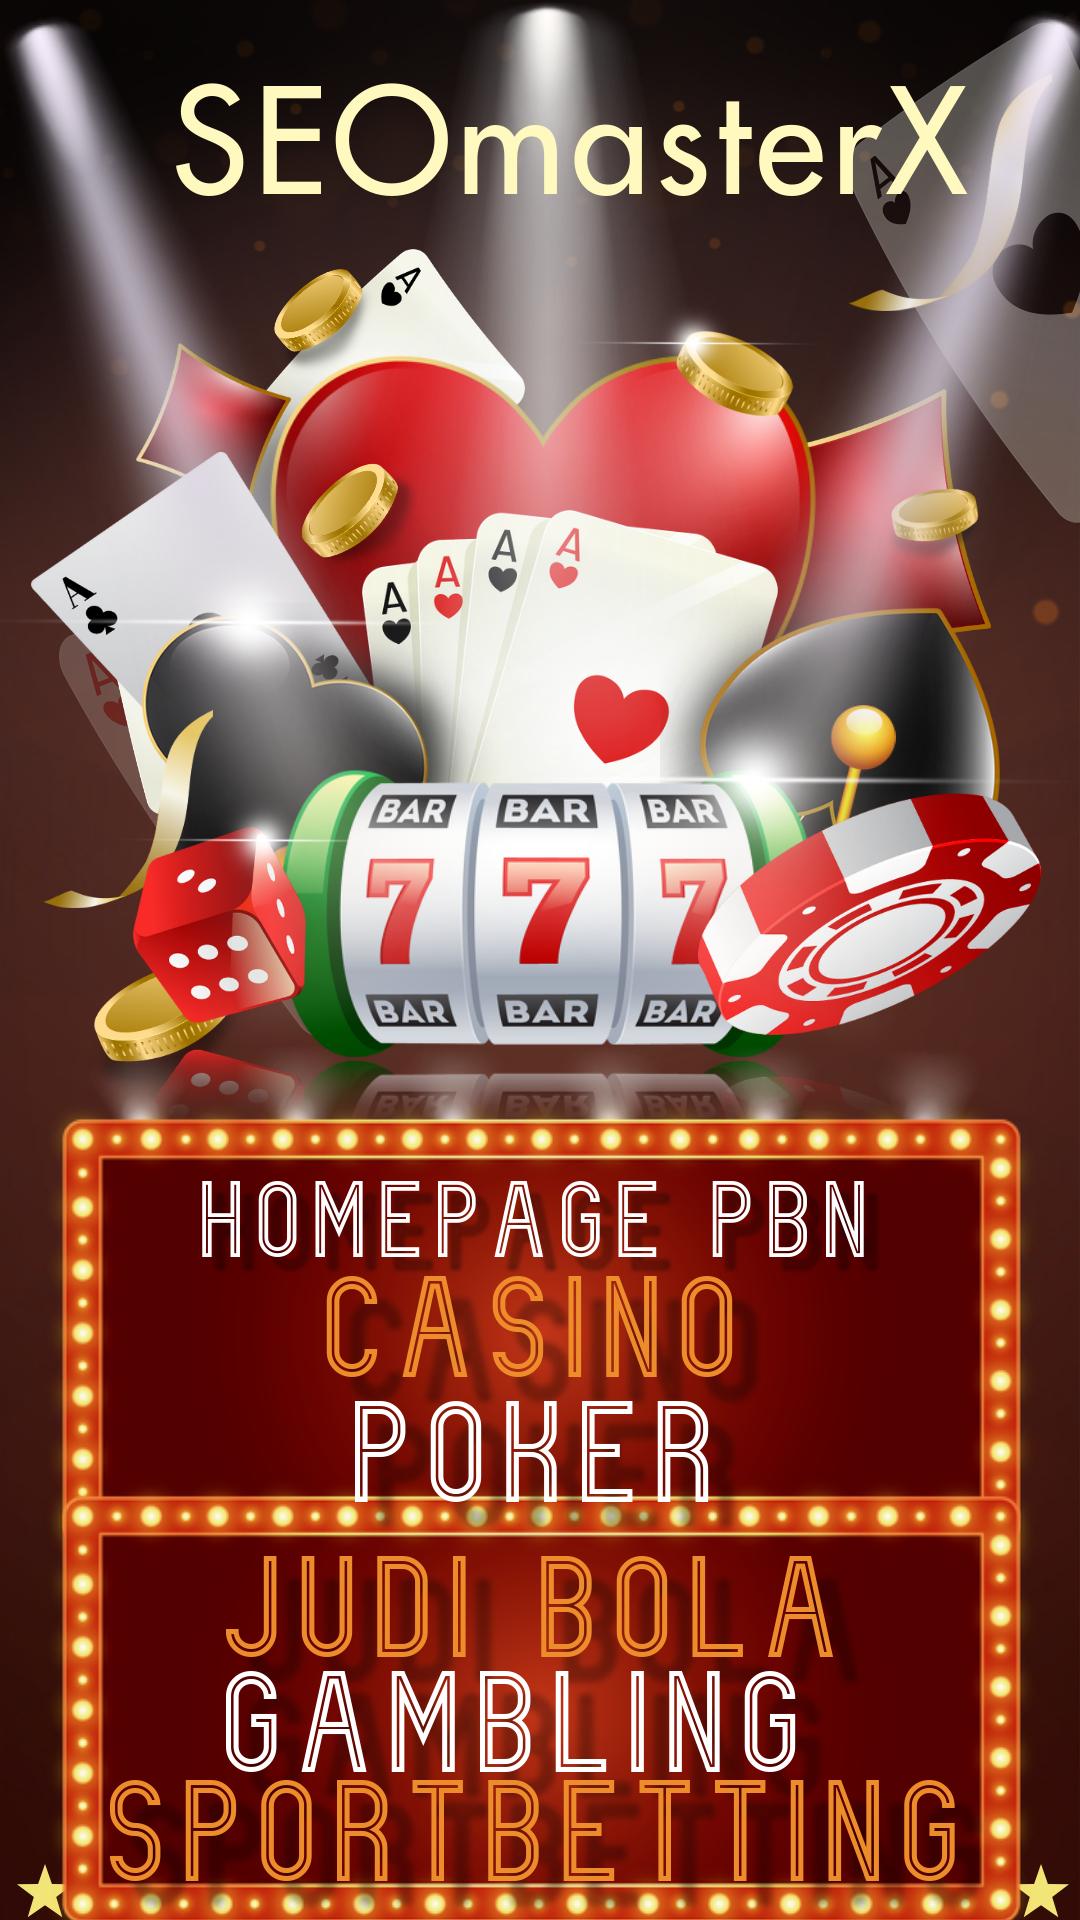 100 Homepage PBN Post Gambling Poker,  Betting,  Judi Bola,  Casino - SEO Package 1st